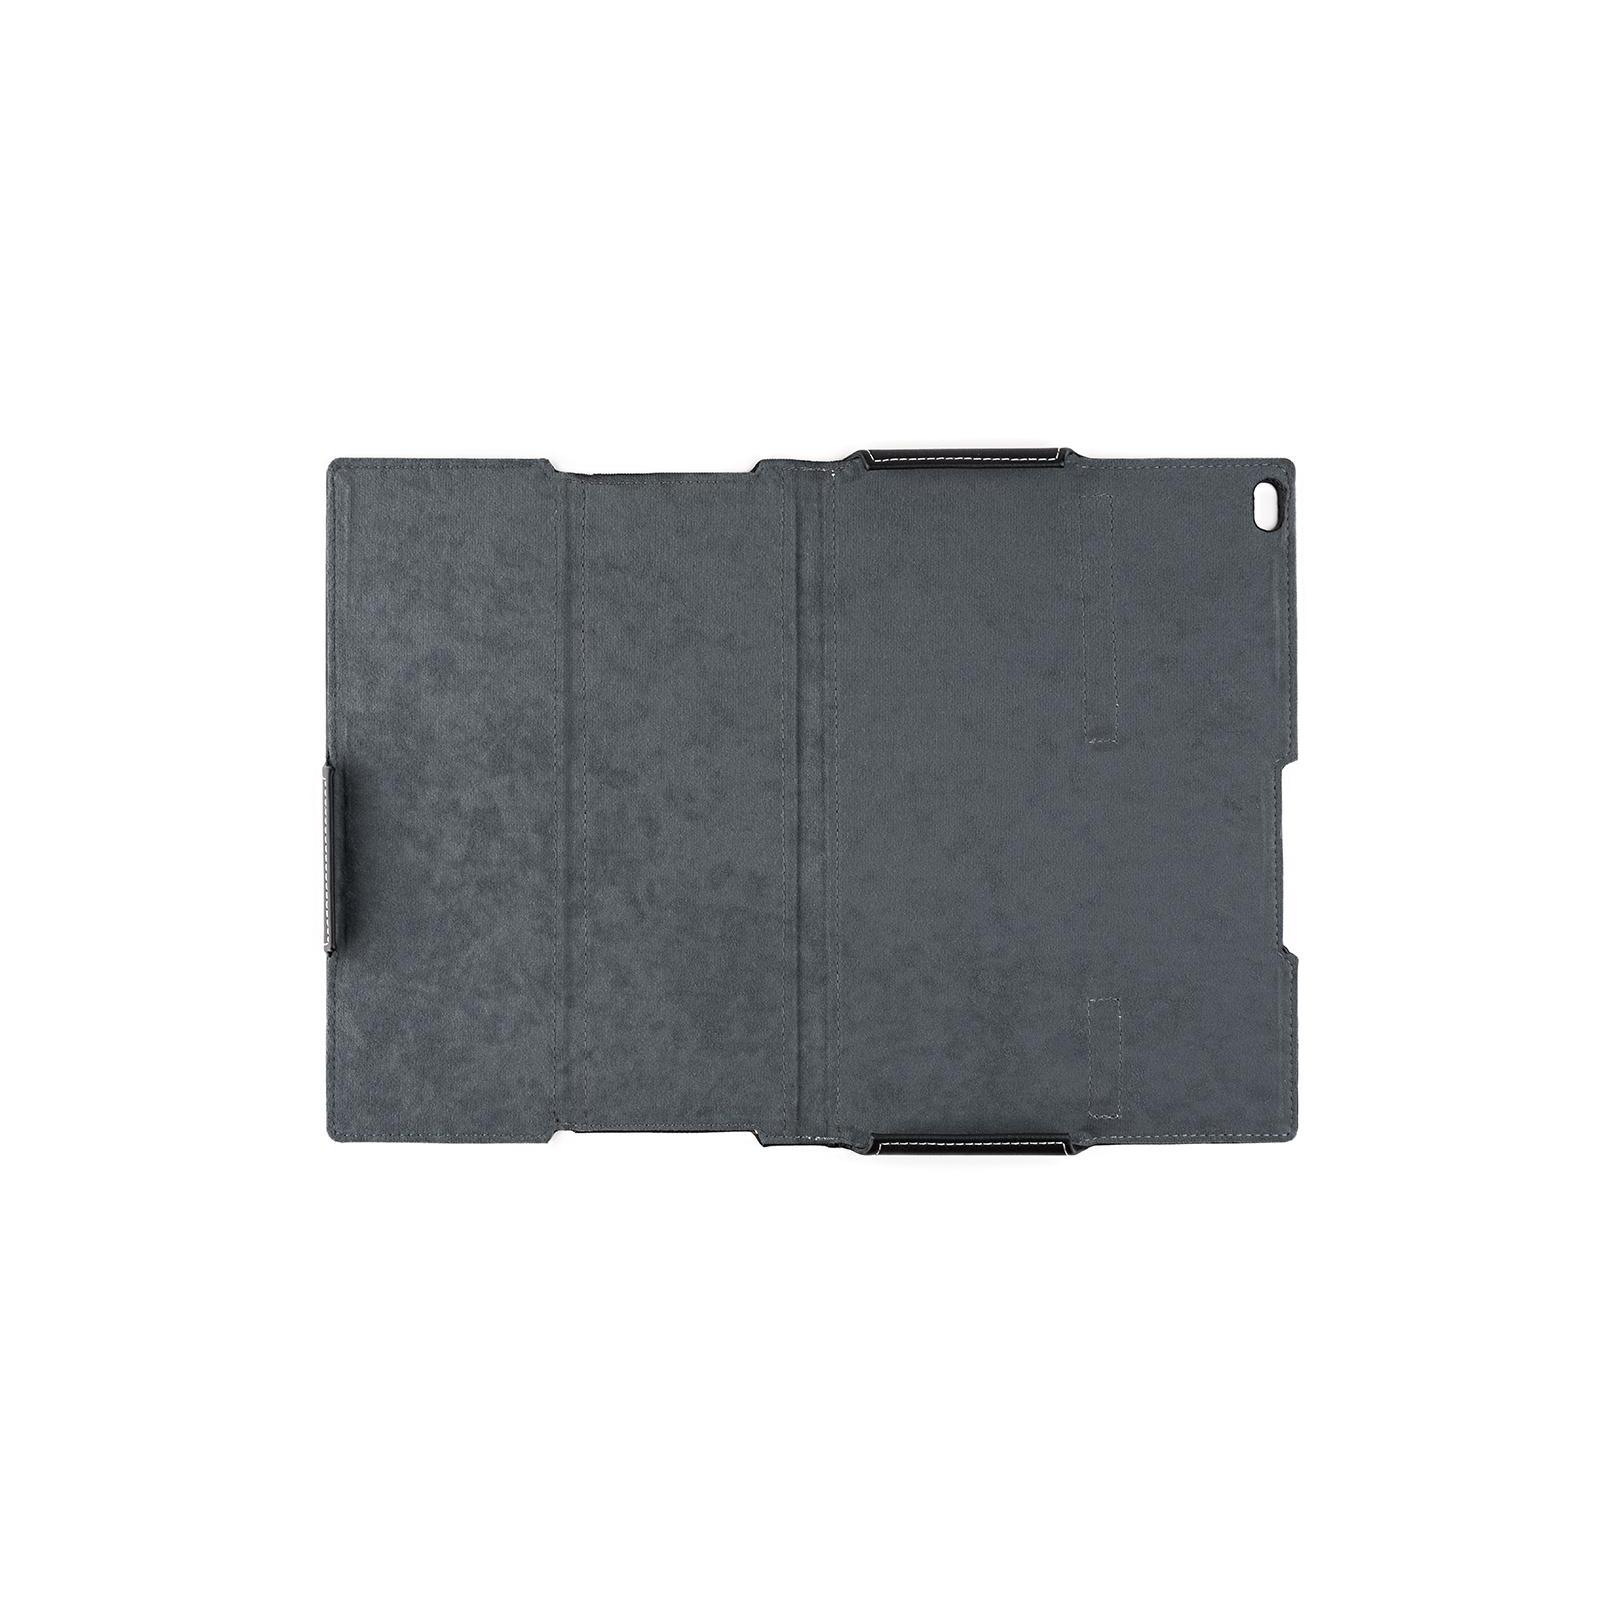 Чехол для планшета Lenovo Tab 4 10 LTE black Vinga (VNTB10LTE) изображение 6